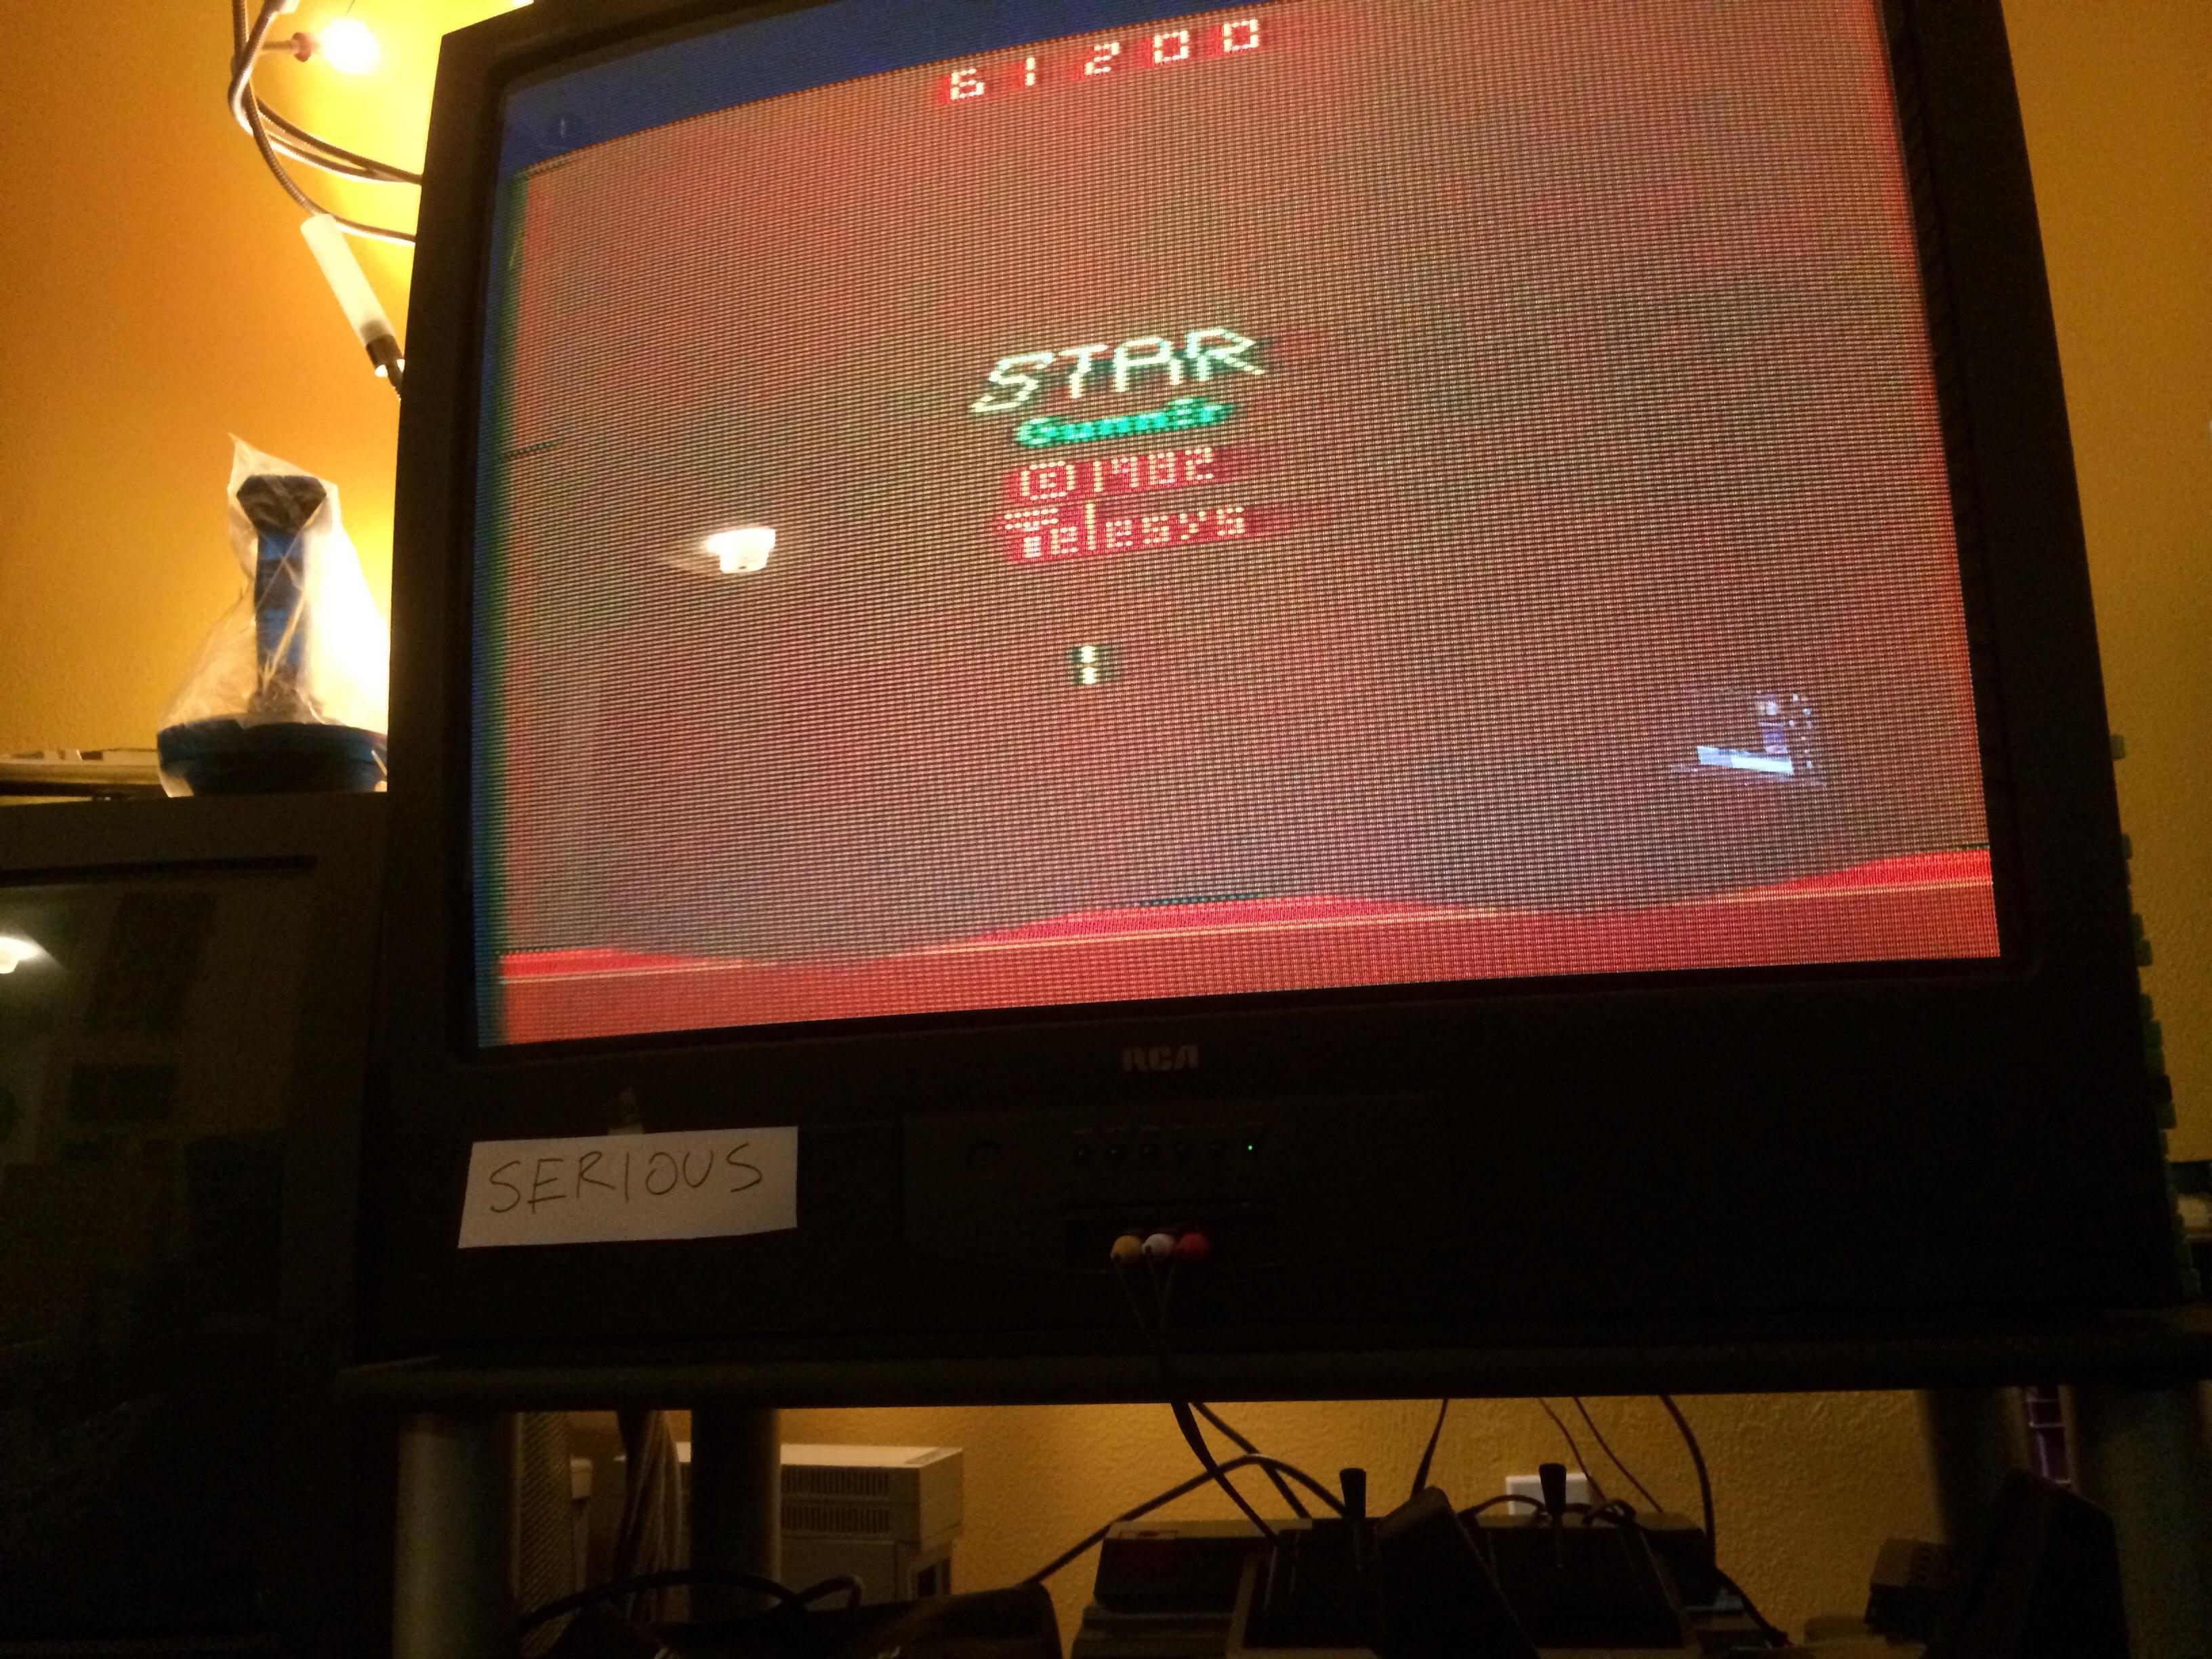 Serious: Stargunner (Atari 2600 Novice/B) 61,200 points on 2014-12-03 05:15:02